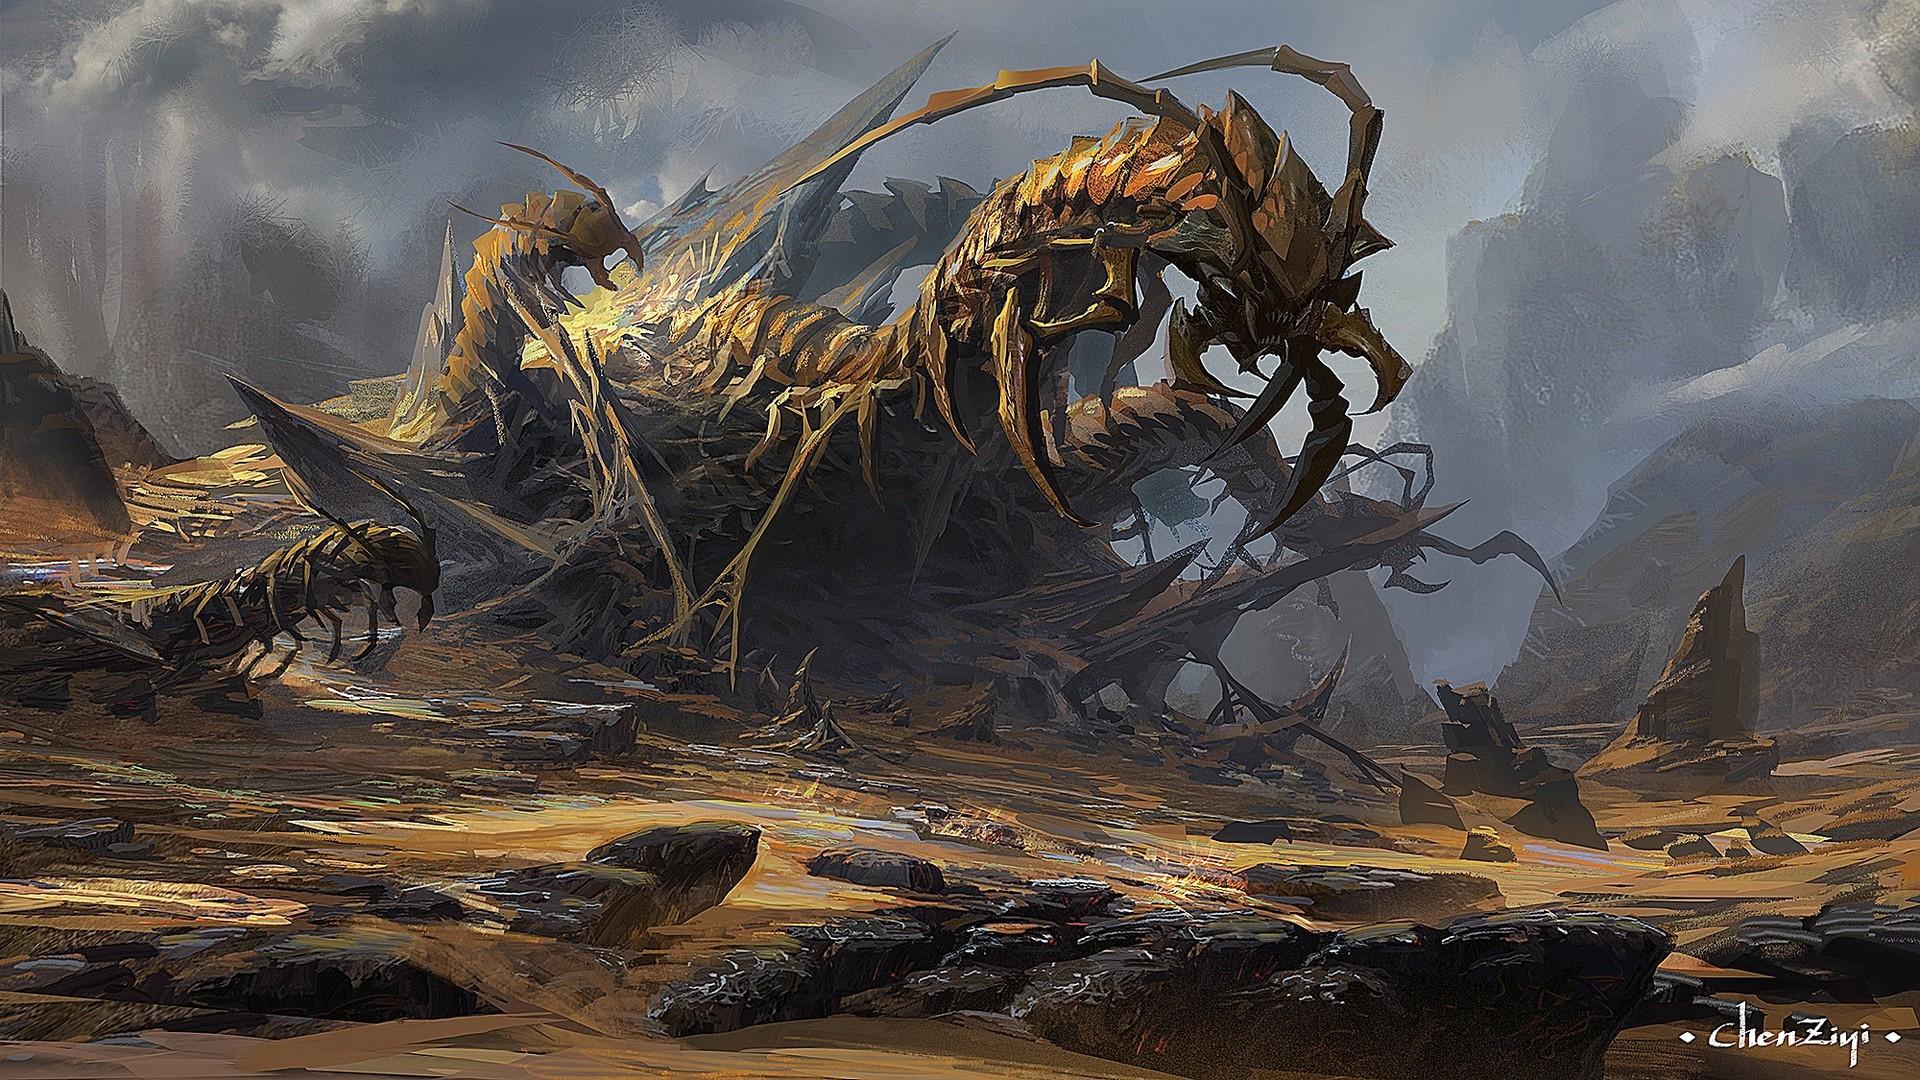 Total War Warhammer Wallpaper Hd Artstation Centipede Mountain Chen Ziyi